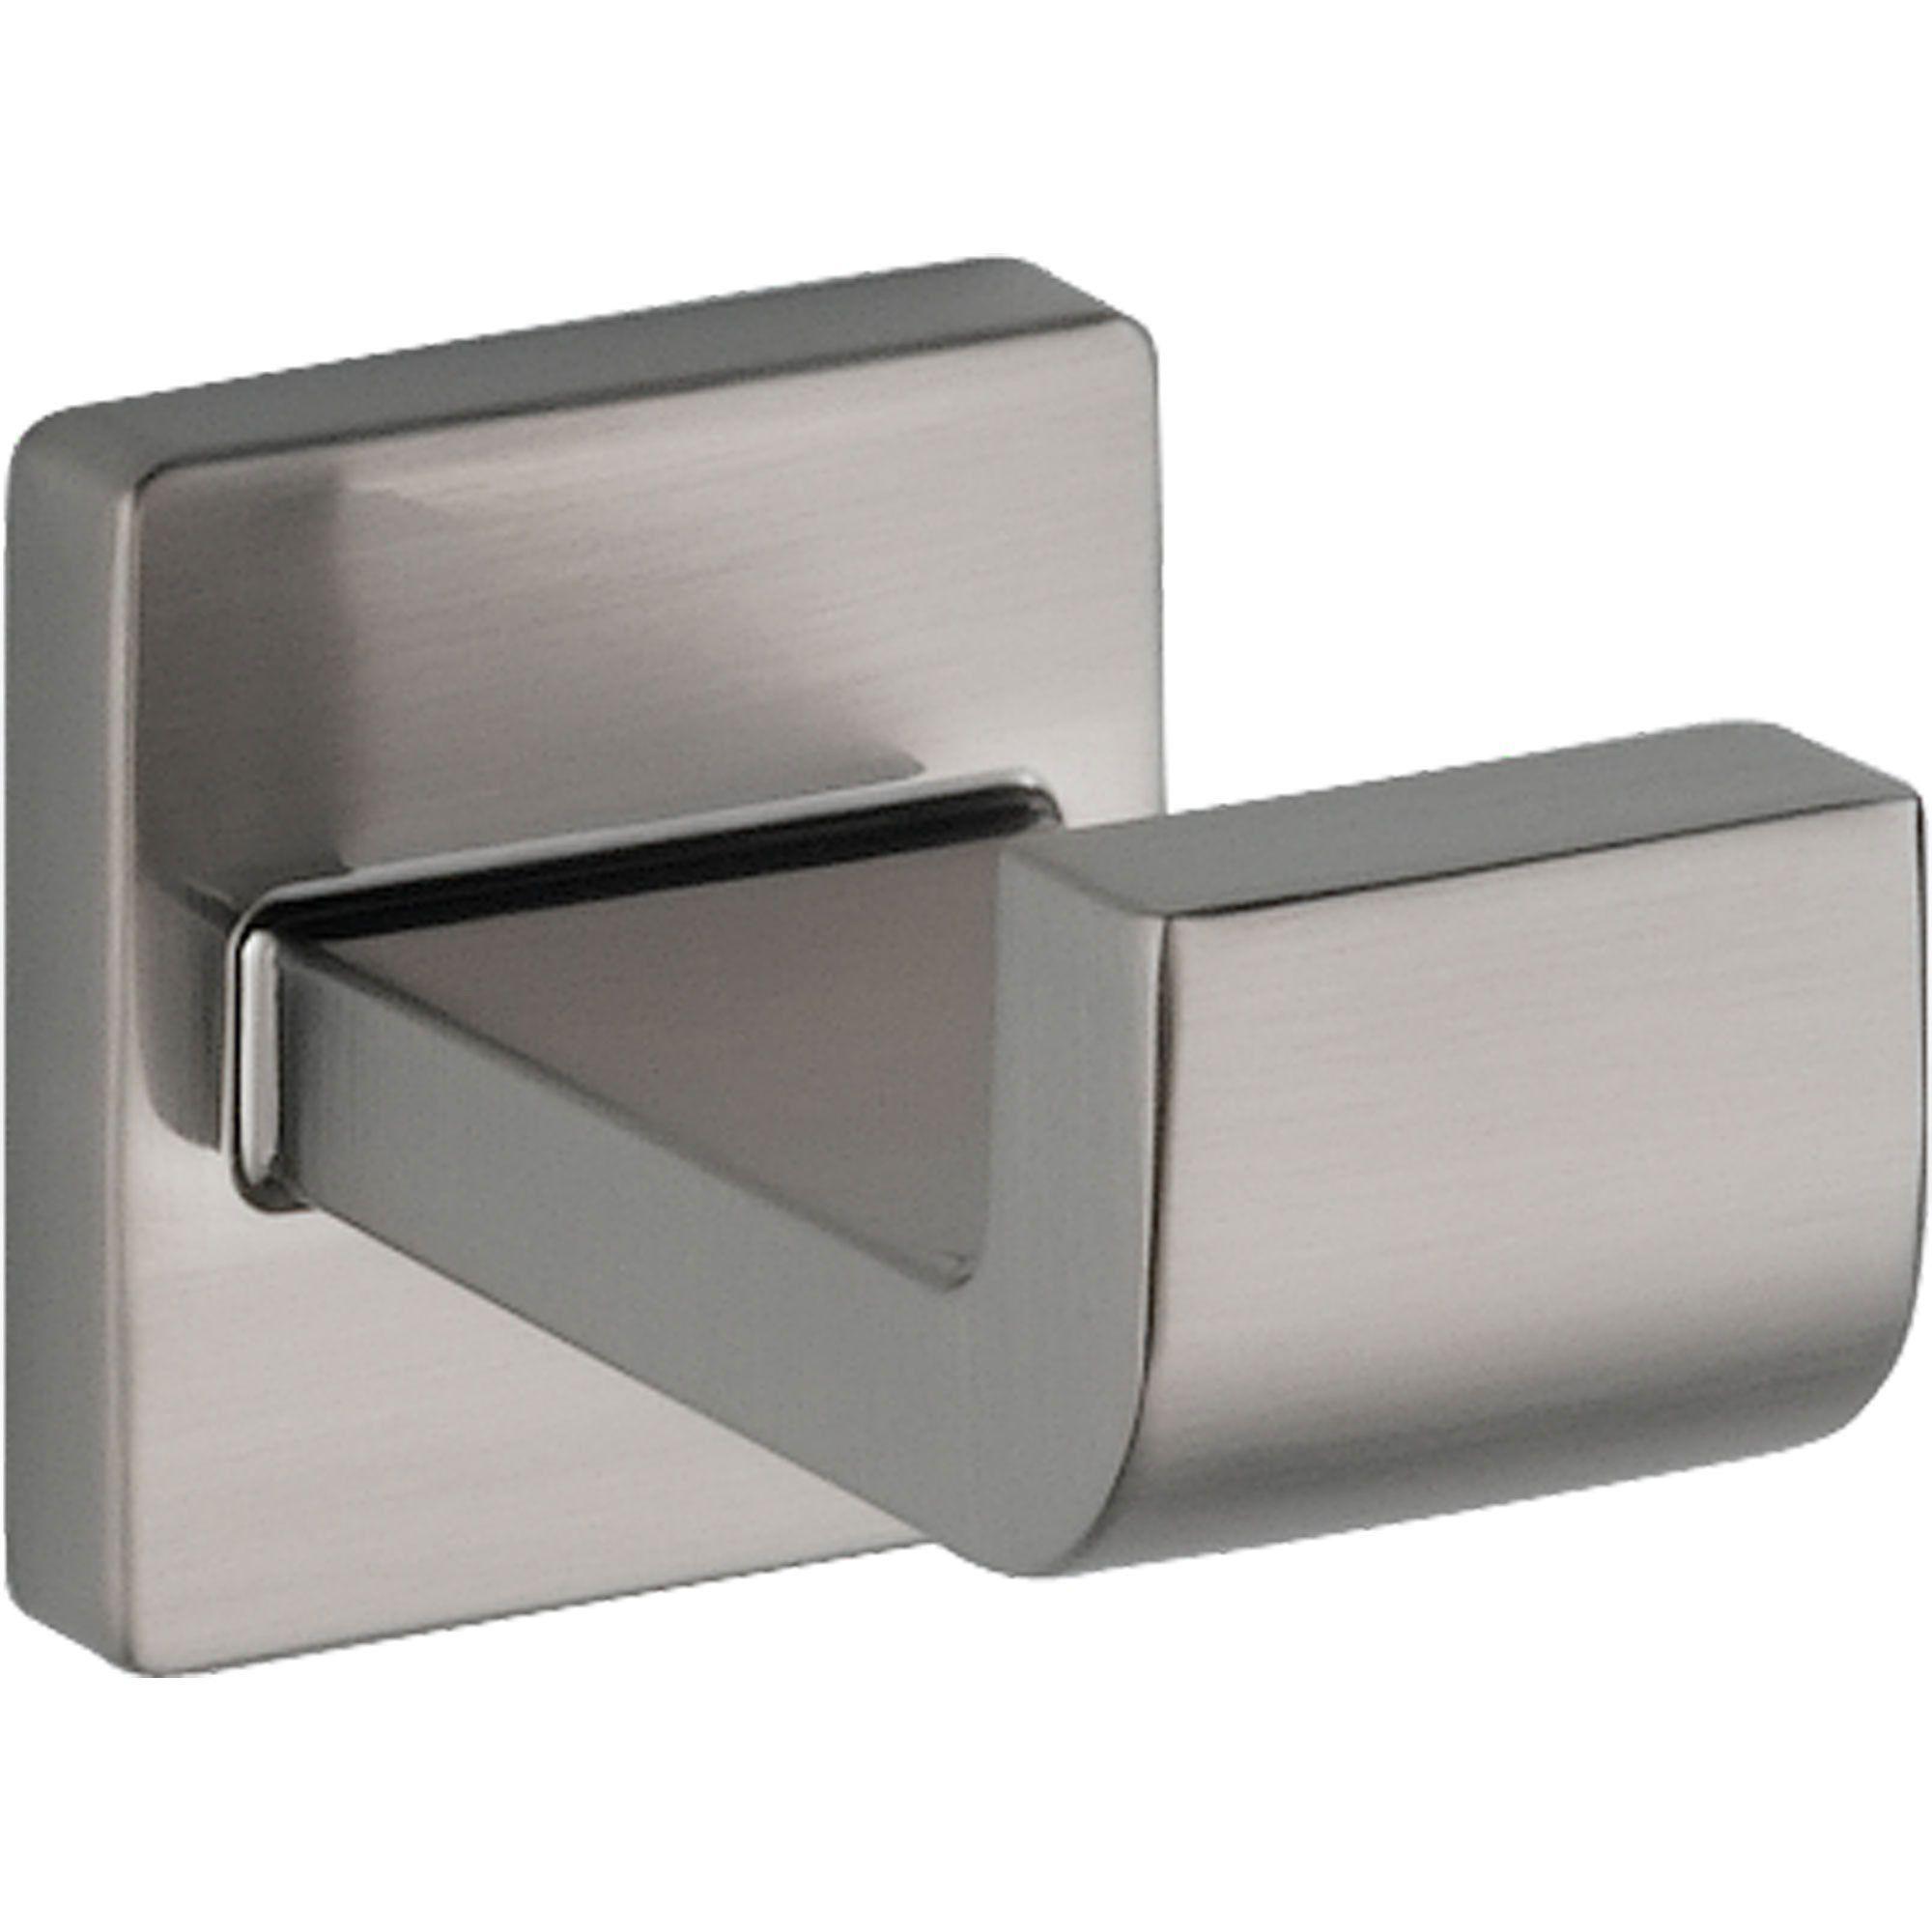 Delta Ara Stainless Steel Finish Modern Bathroom Accessory Robe Hook ...